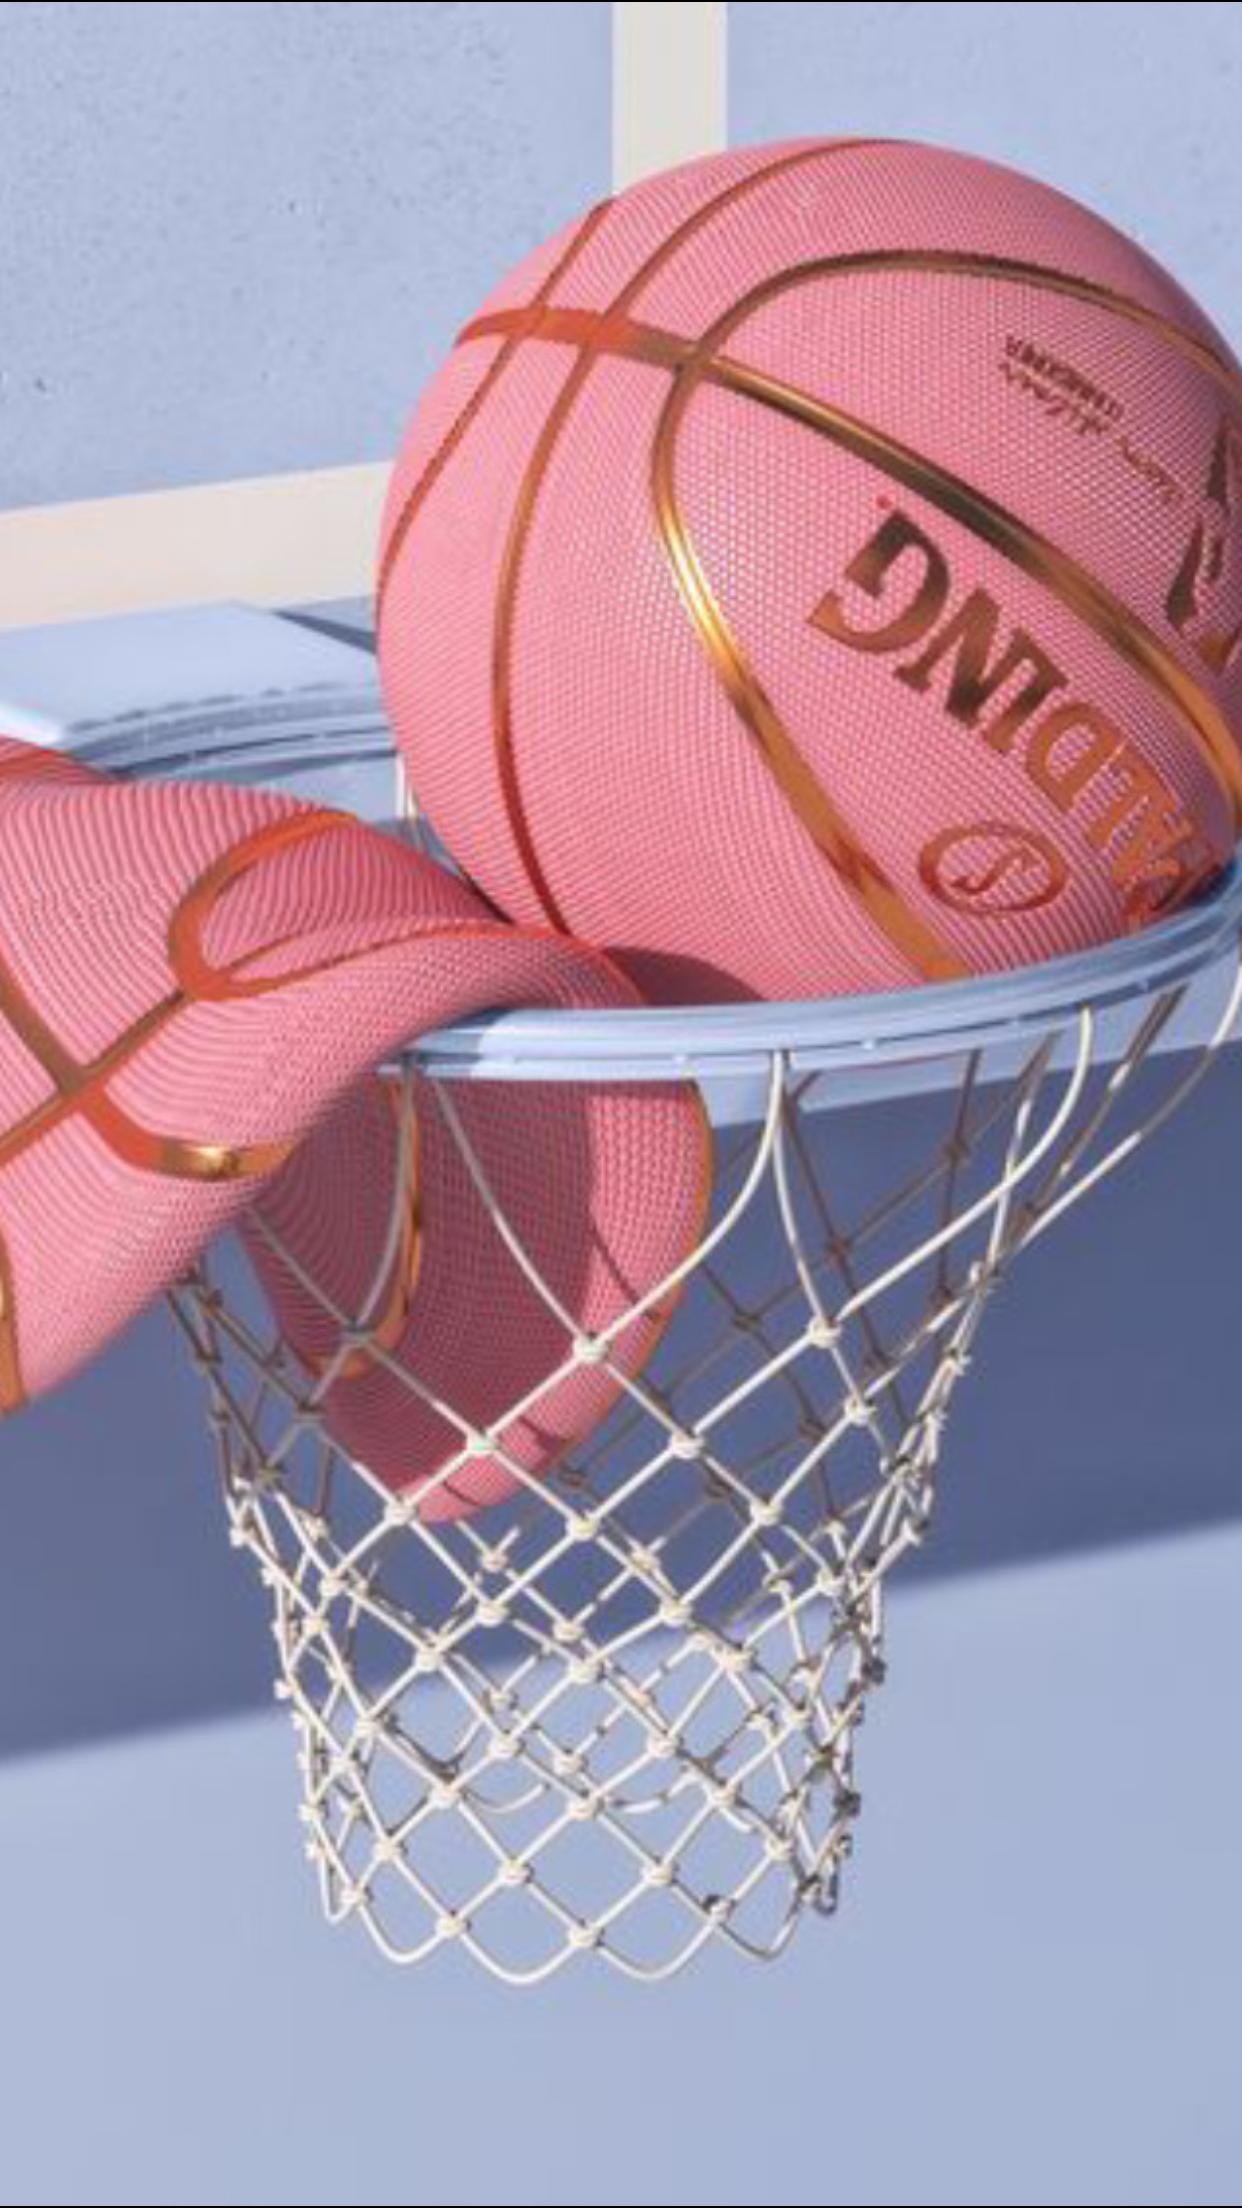 Pastel Aesthetic Pink Basketball Art Collage Wall Pastel Pink Aesthetic Aesthetic Pastel Wallpaper